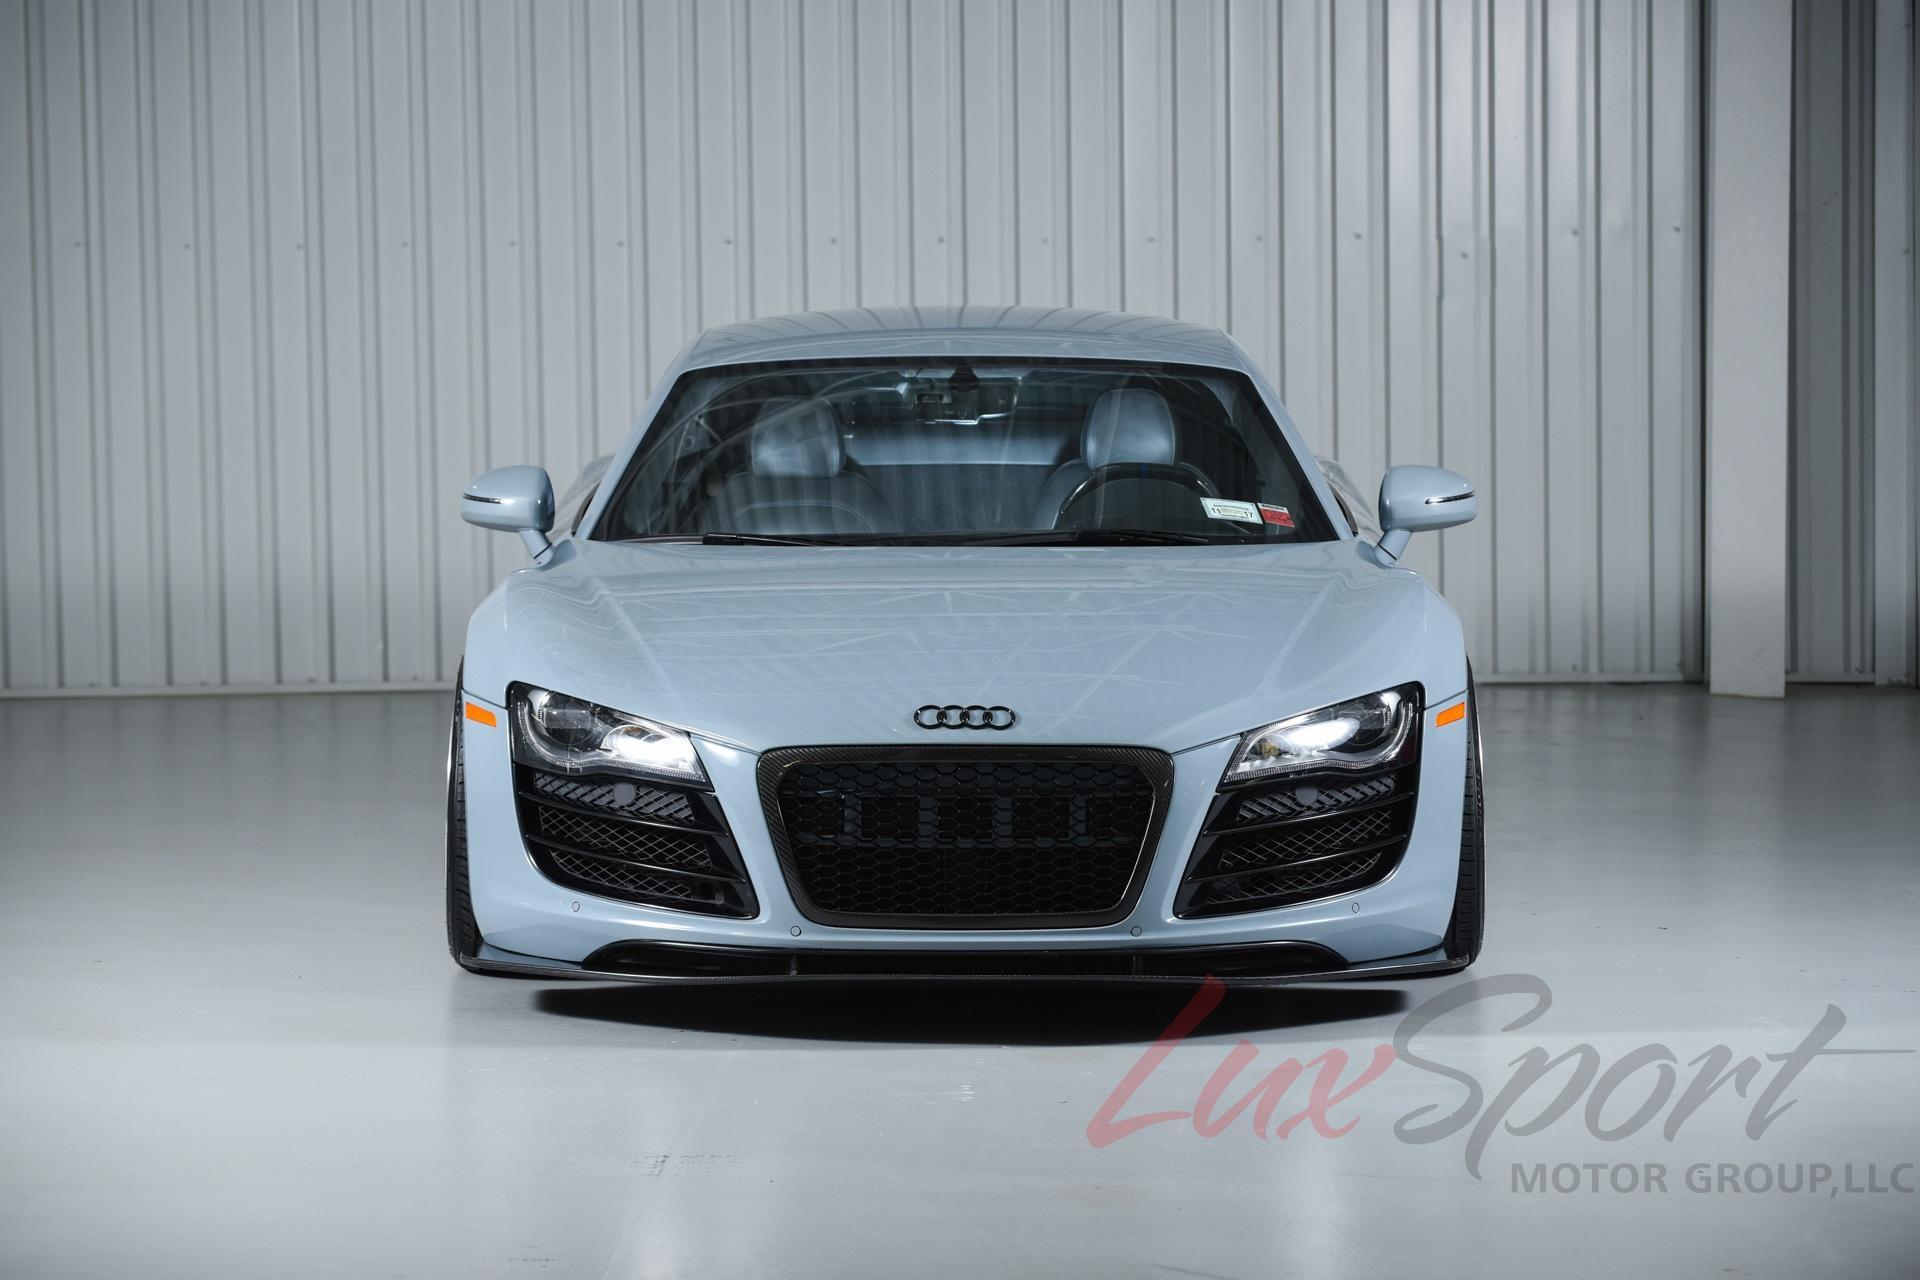 2010 Audi R8 V10 Coupe 5 2 quattro Stock for sale near New